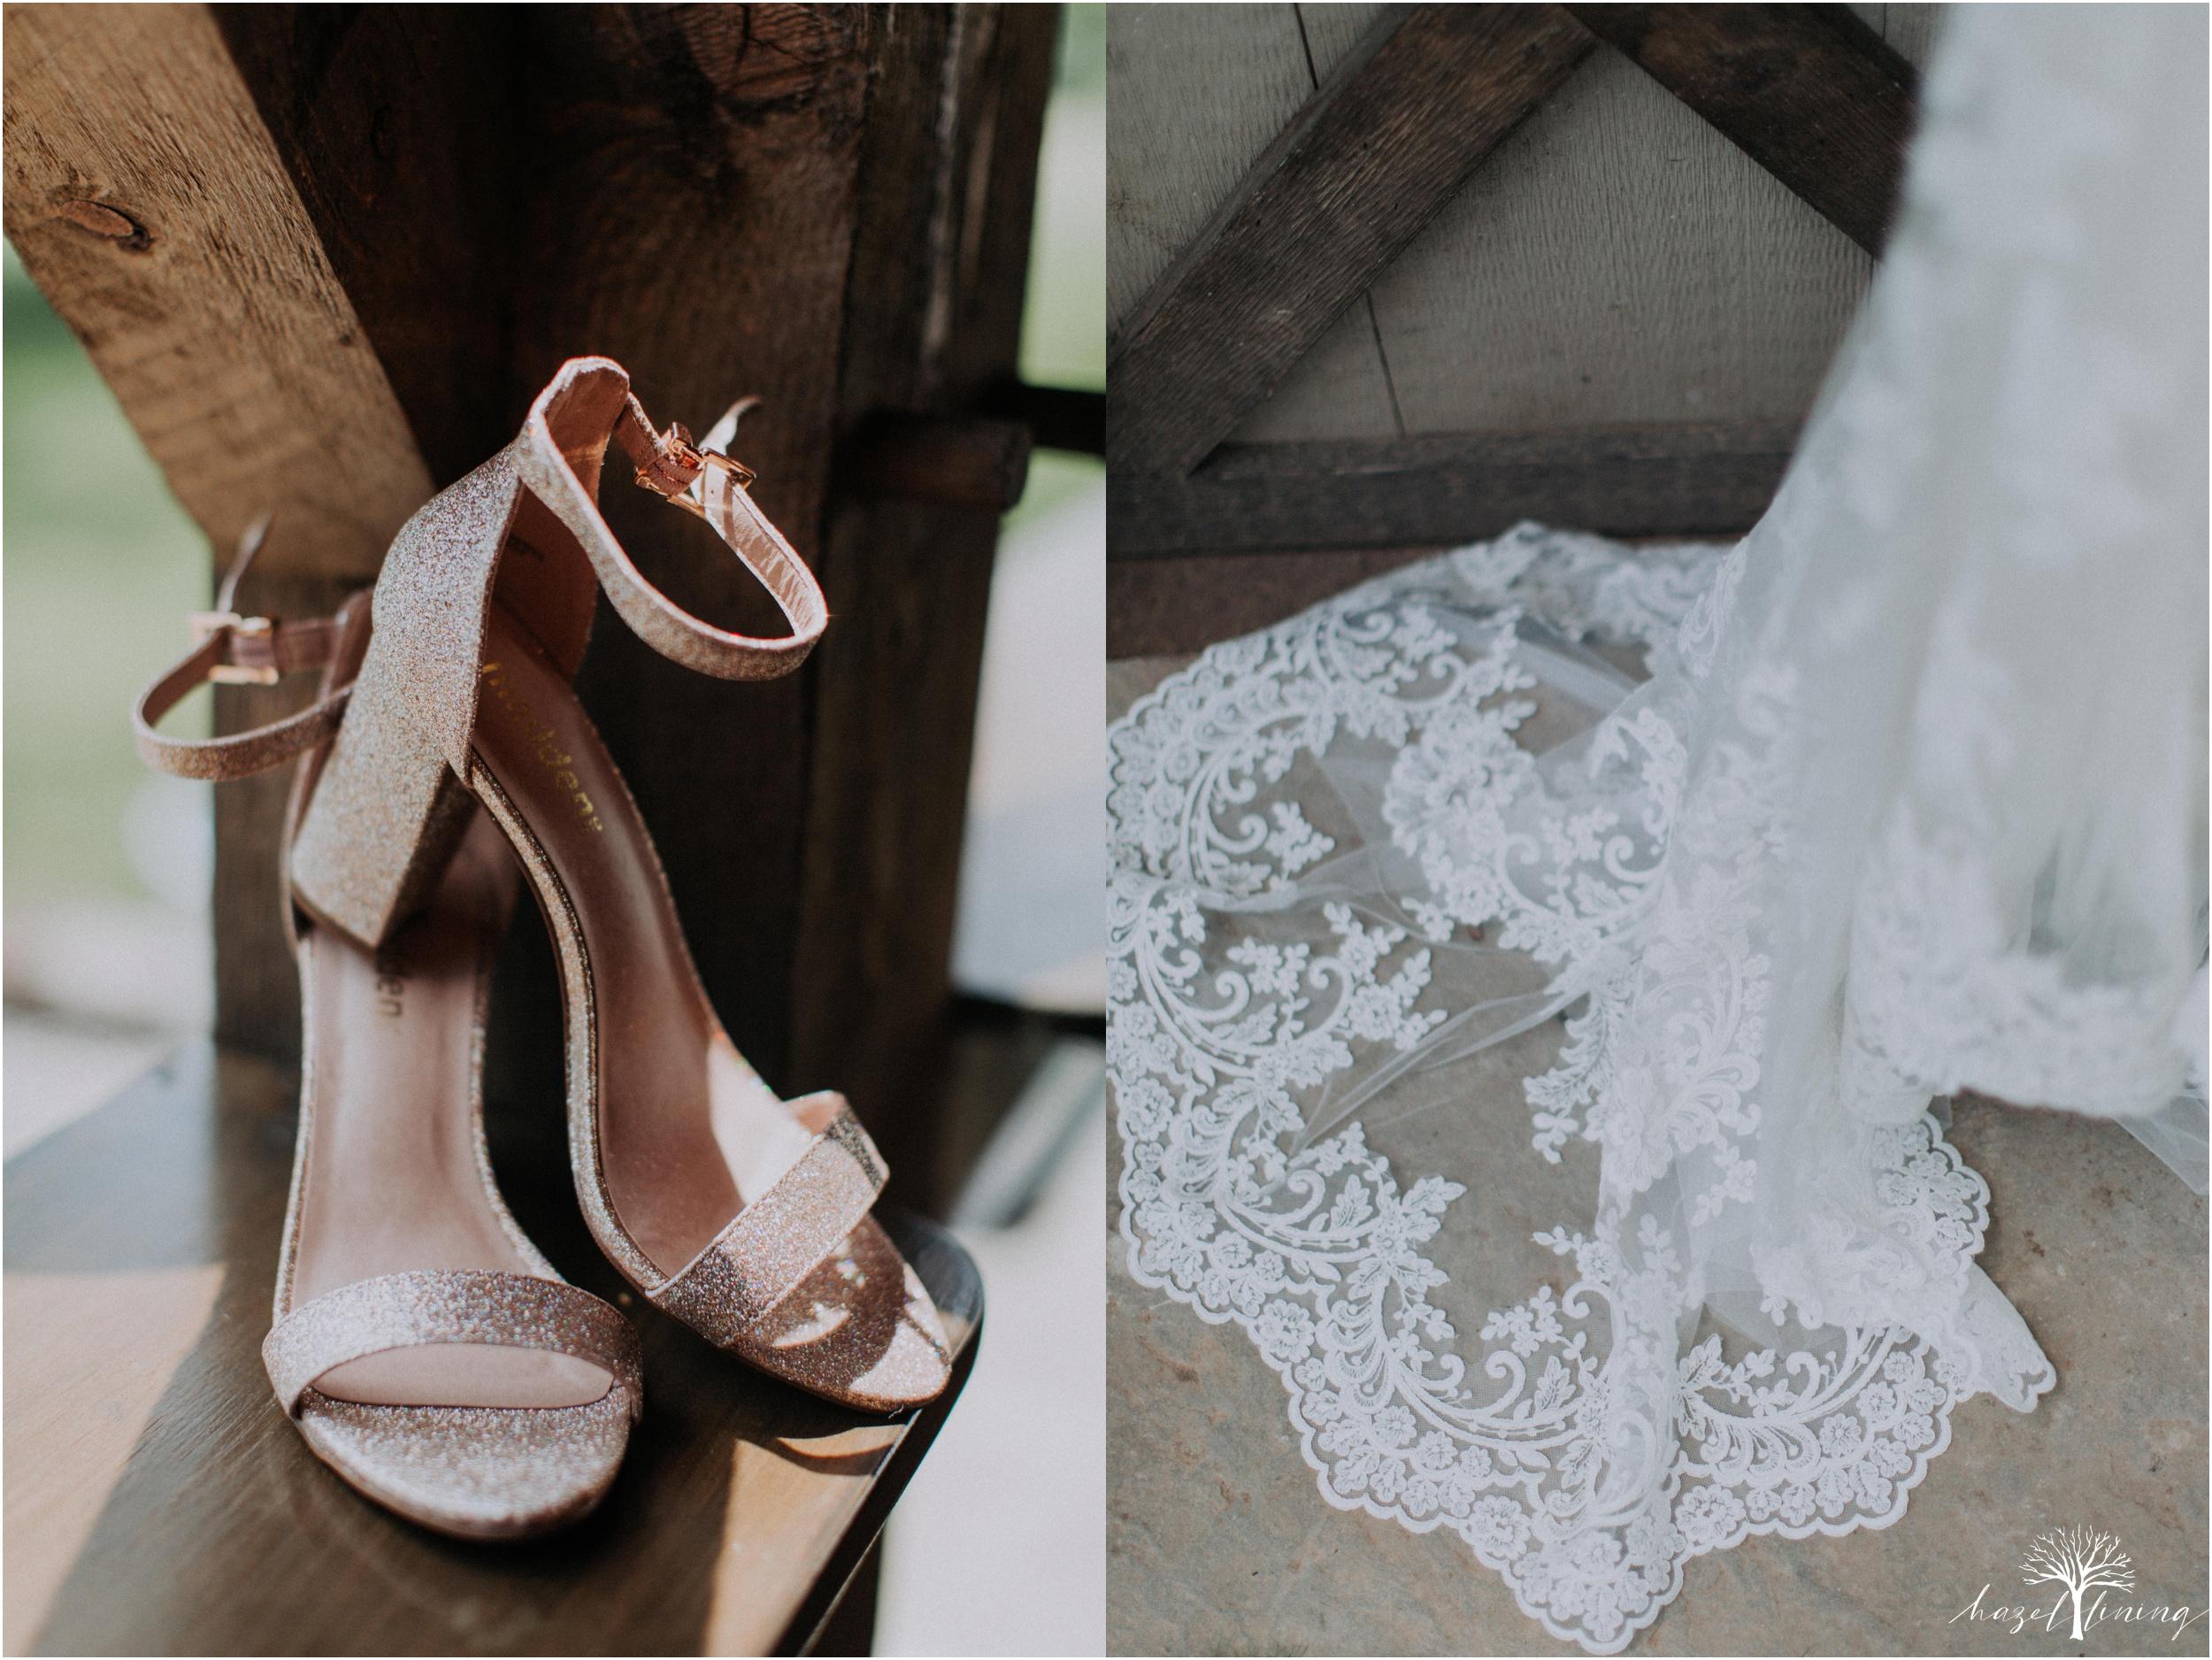 hazel-lining-travel-wedding-elopement-photography-lisa-landon-shoemaker-the-farm-bakery-and-events-bucks-county-quakertown-pennsylvania-summer-country-outdoor-farm-wedding_0004.jpg